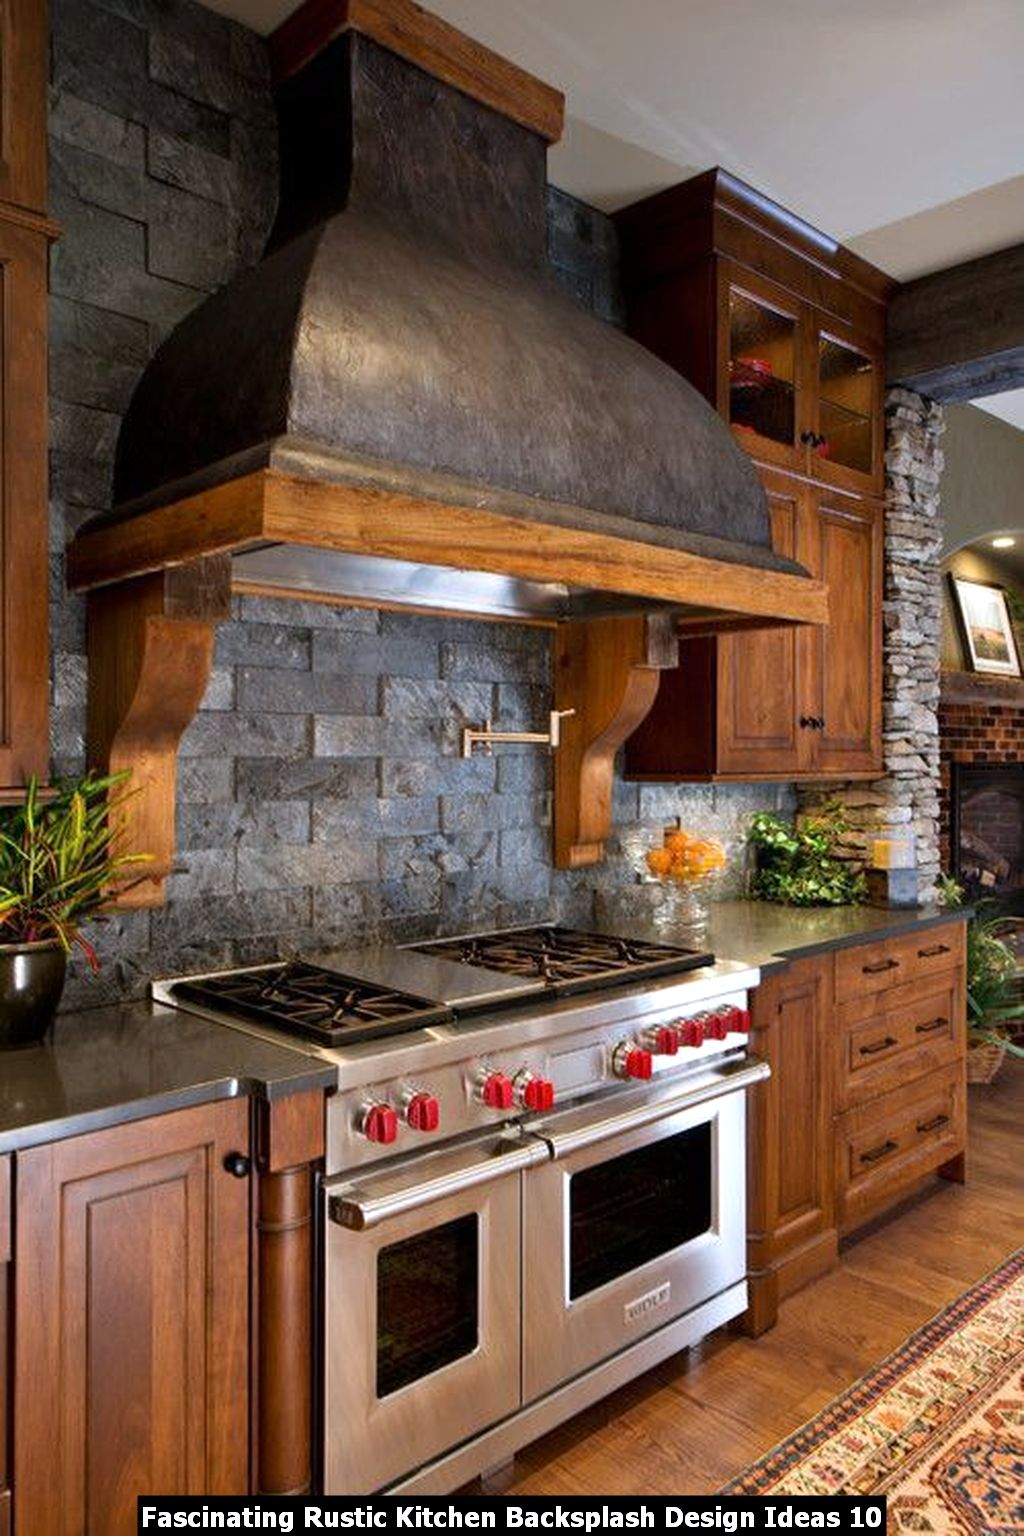 Fascinating Rustic Kitchen Backsplash Design Ideas 10